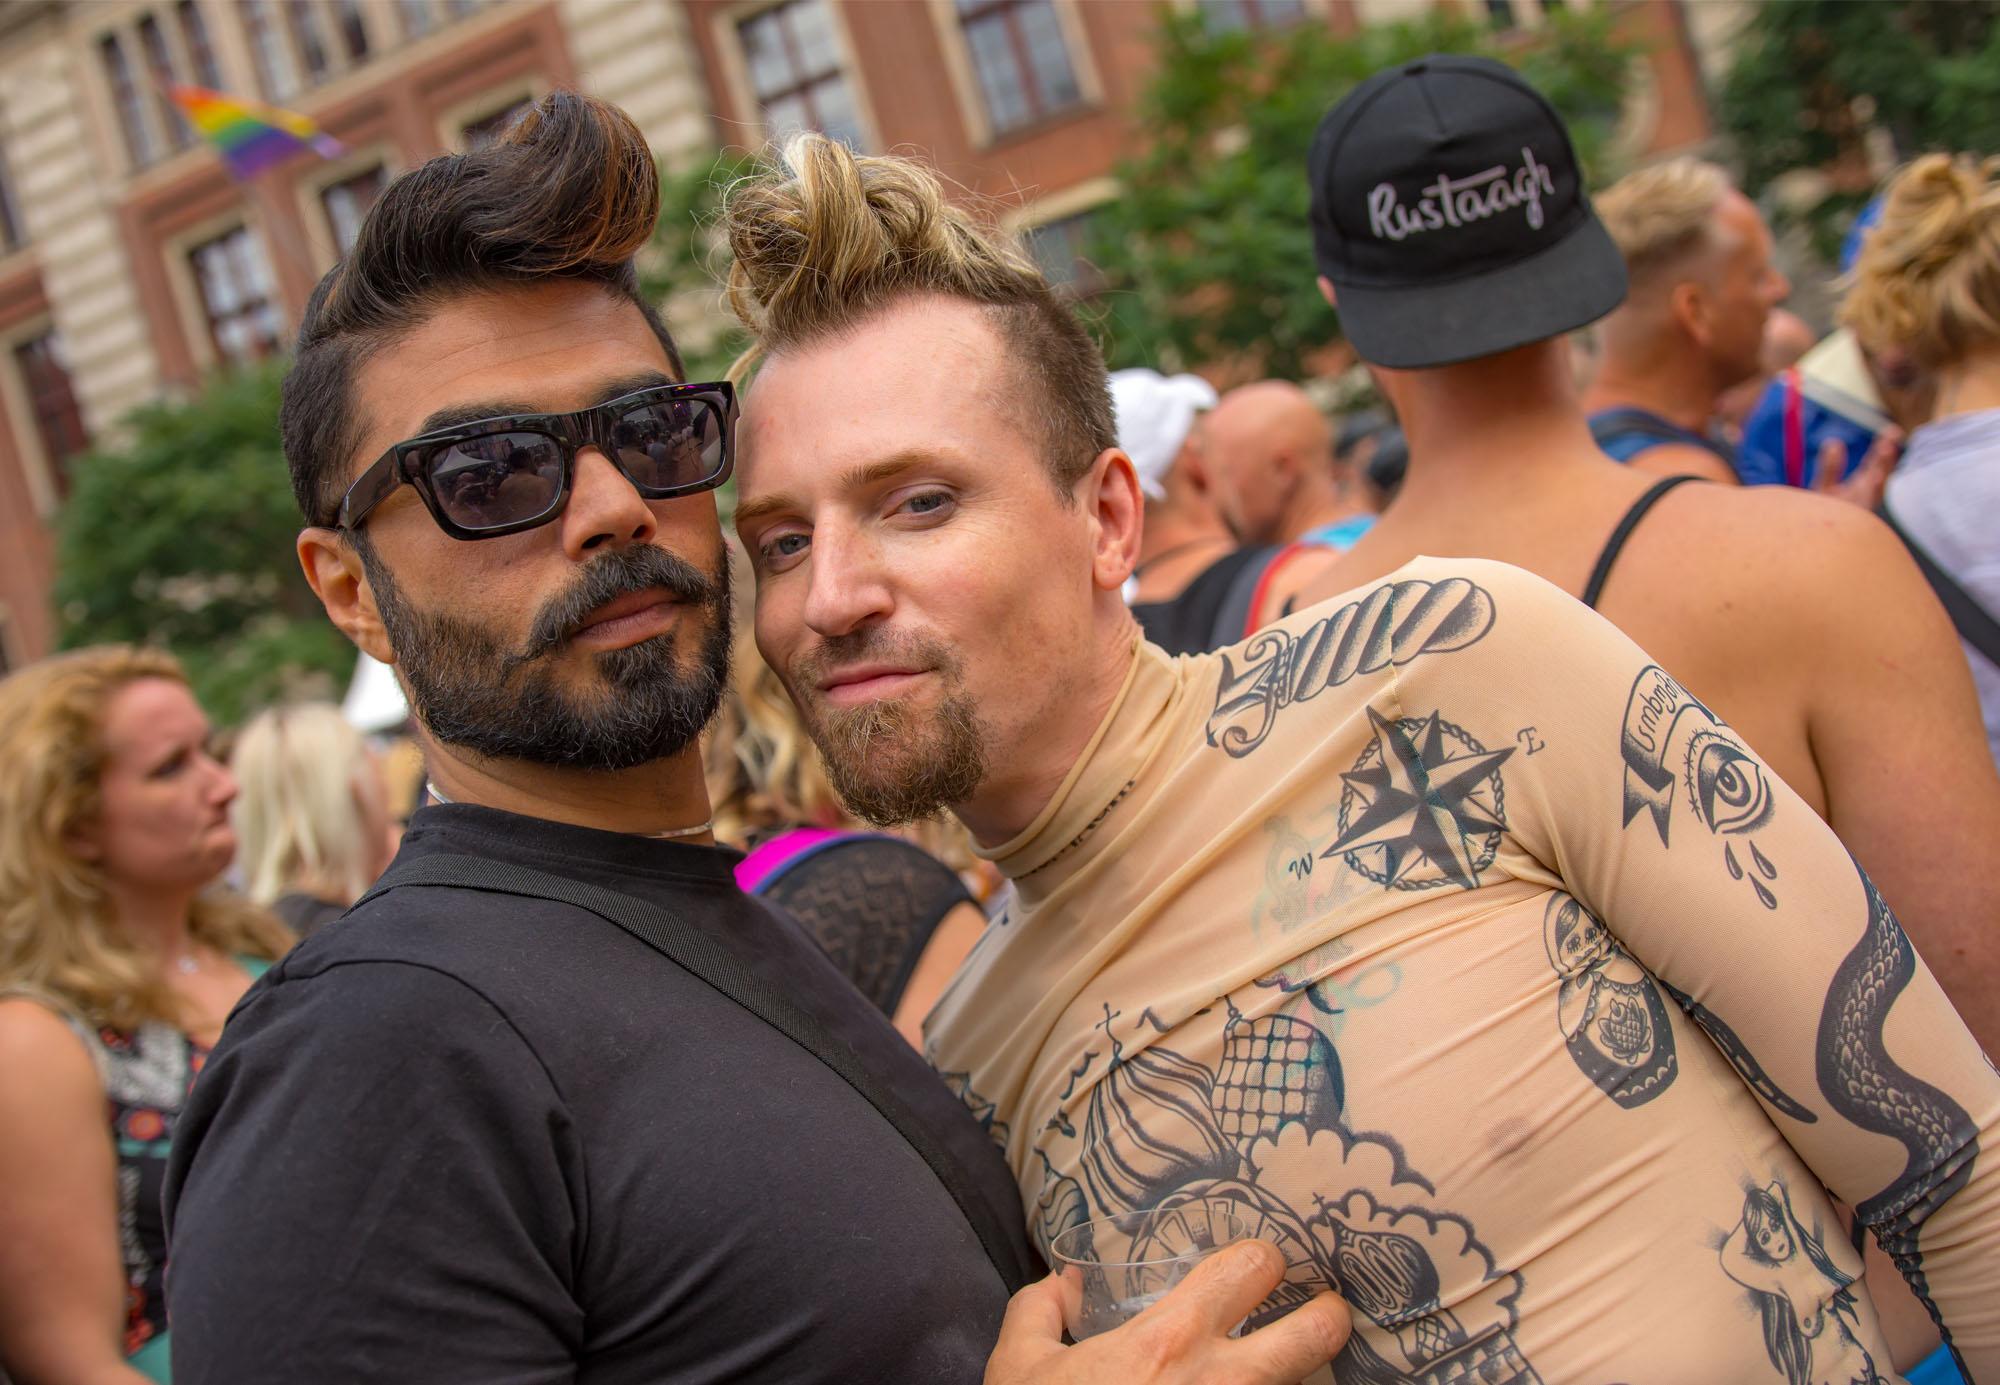 Amsterdam-Pride-03-08-2019-_0022_Hinterg